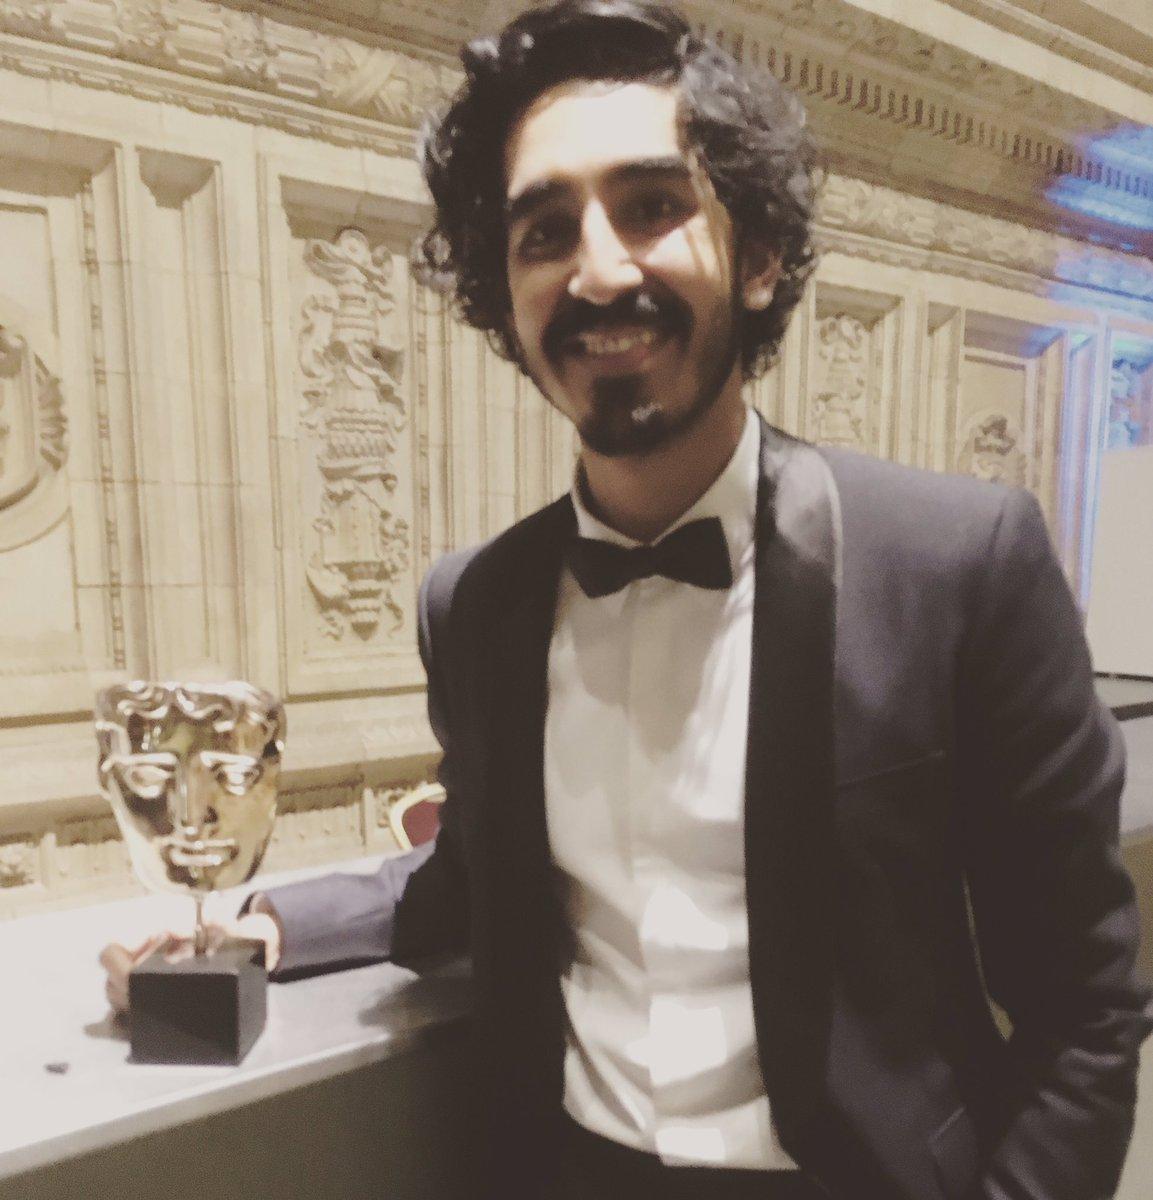 From Harrow to BAFTA glory, via Slumdog: The rise and rise of west London's Dev Patel